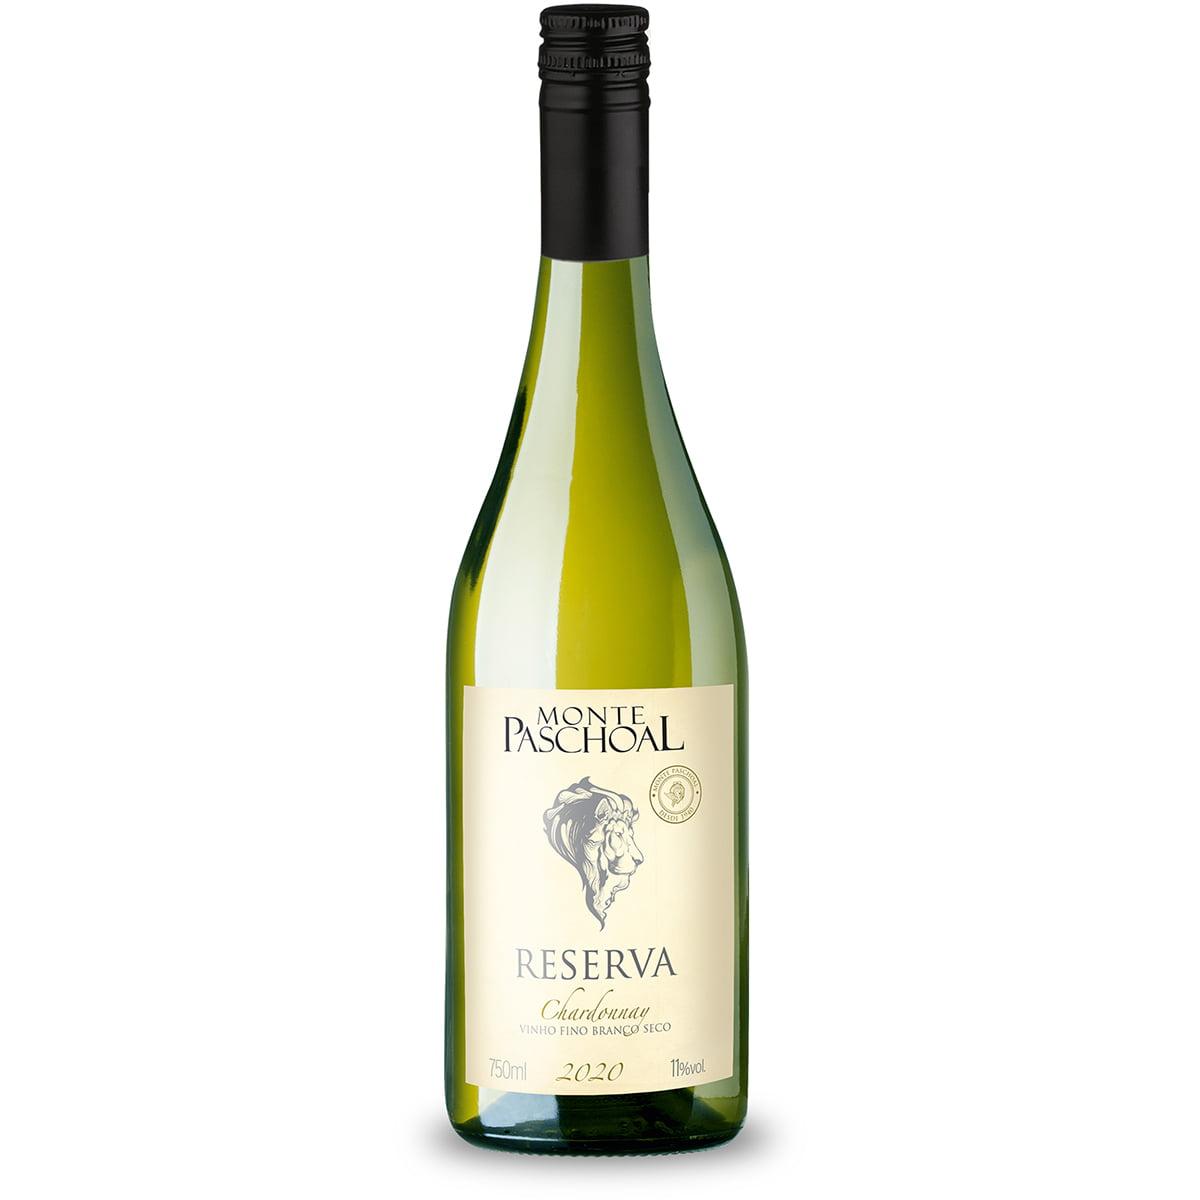 Vinho Monte Paschoal Reserva Chardonnay Branco Seco 750ml